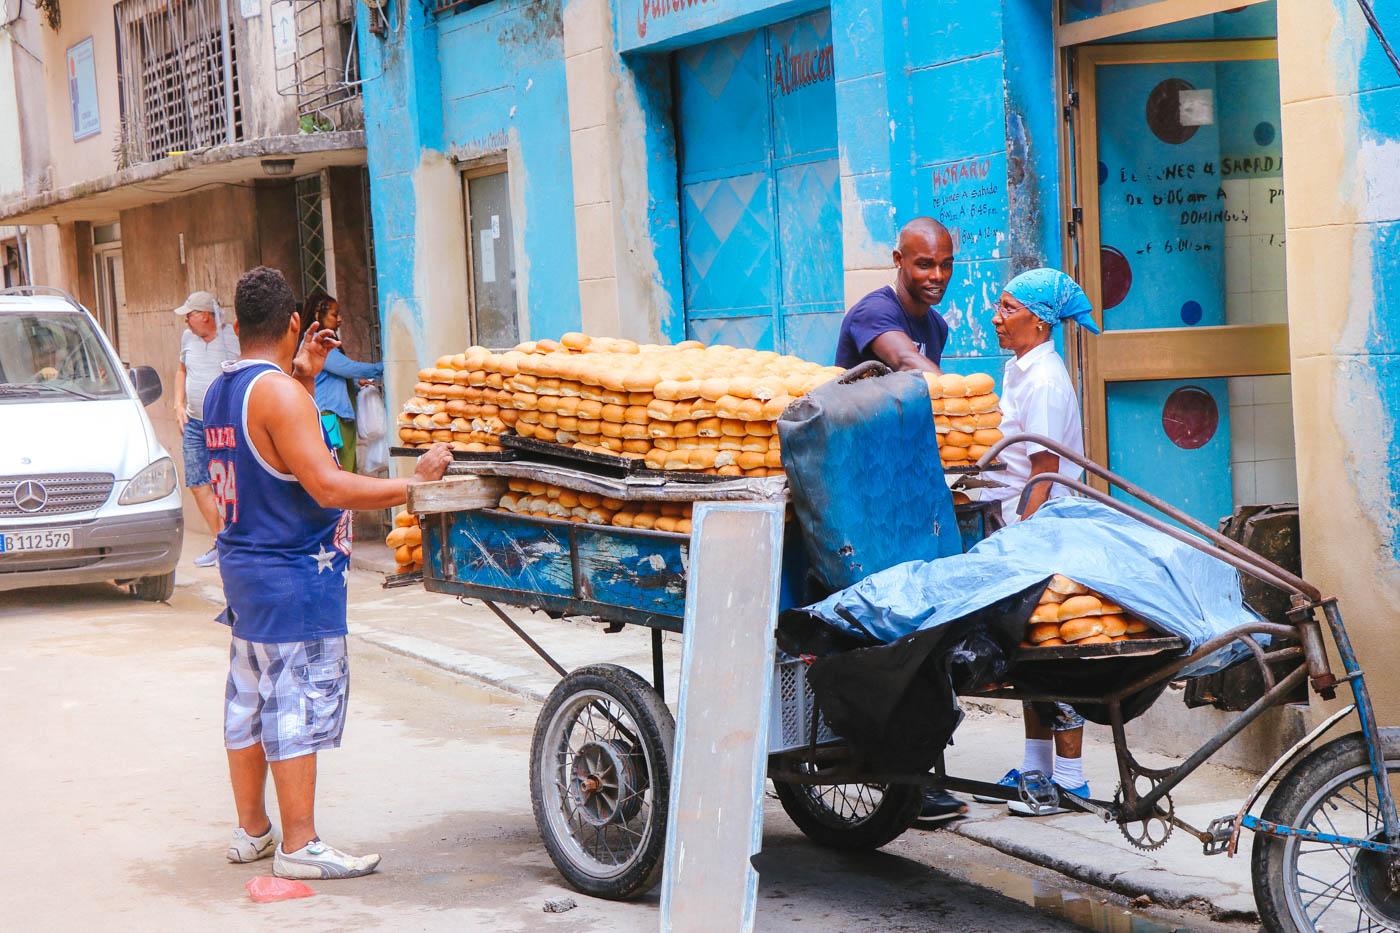 Cuban Bakery